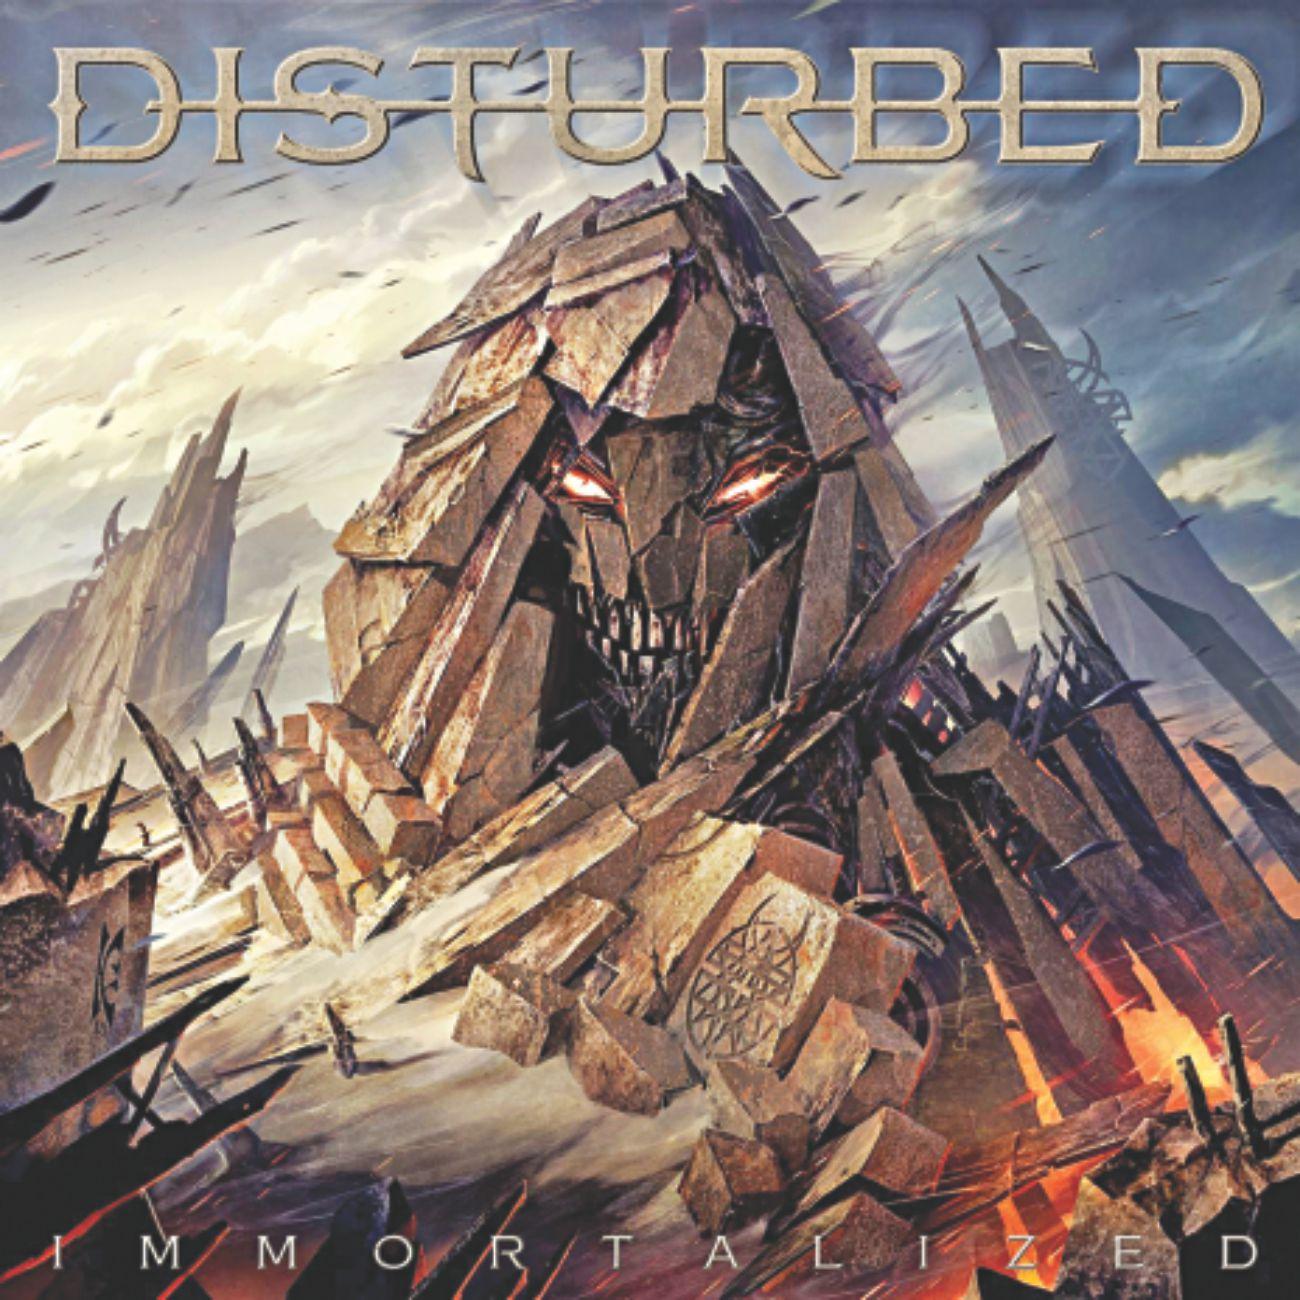 Immortalized disturbed album download.